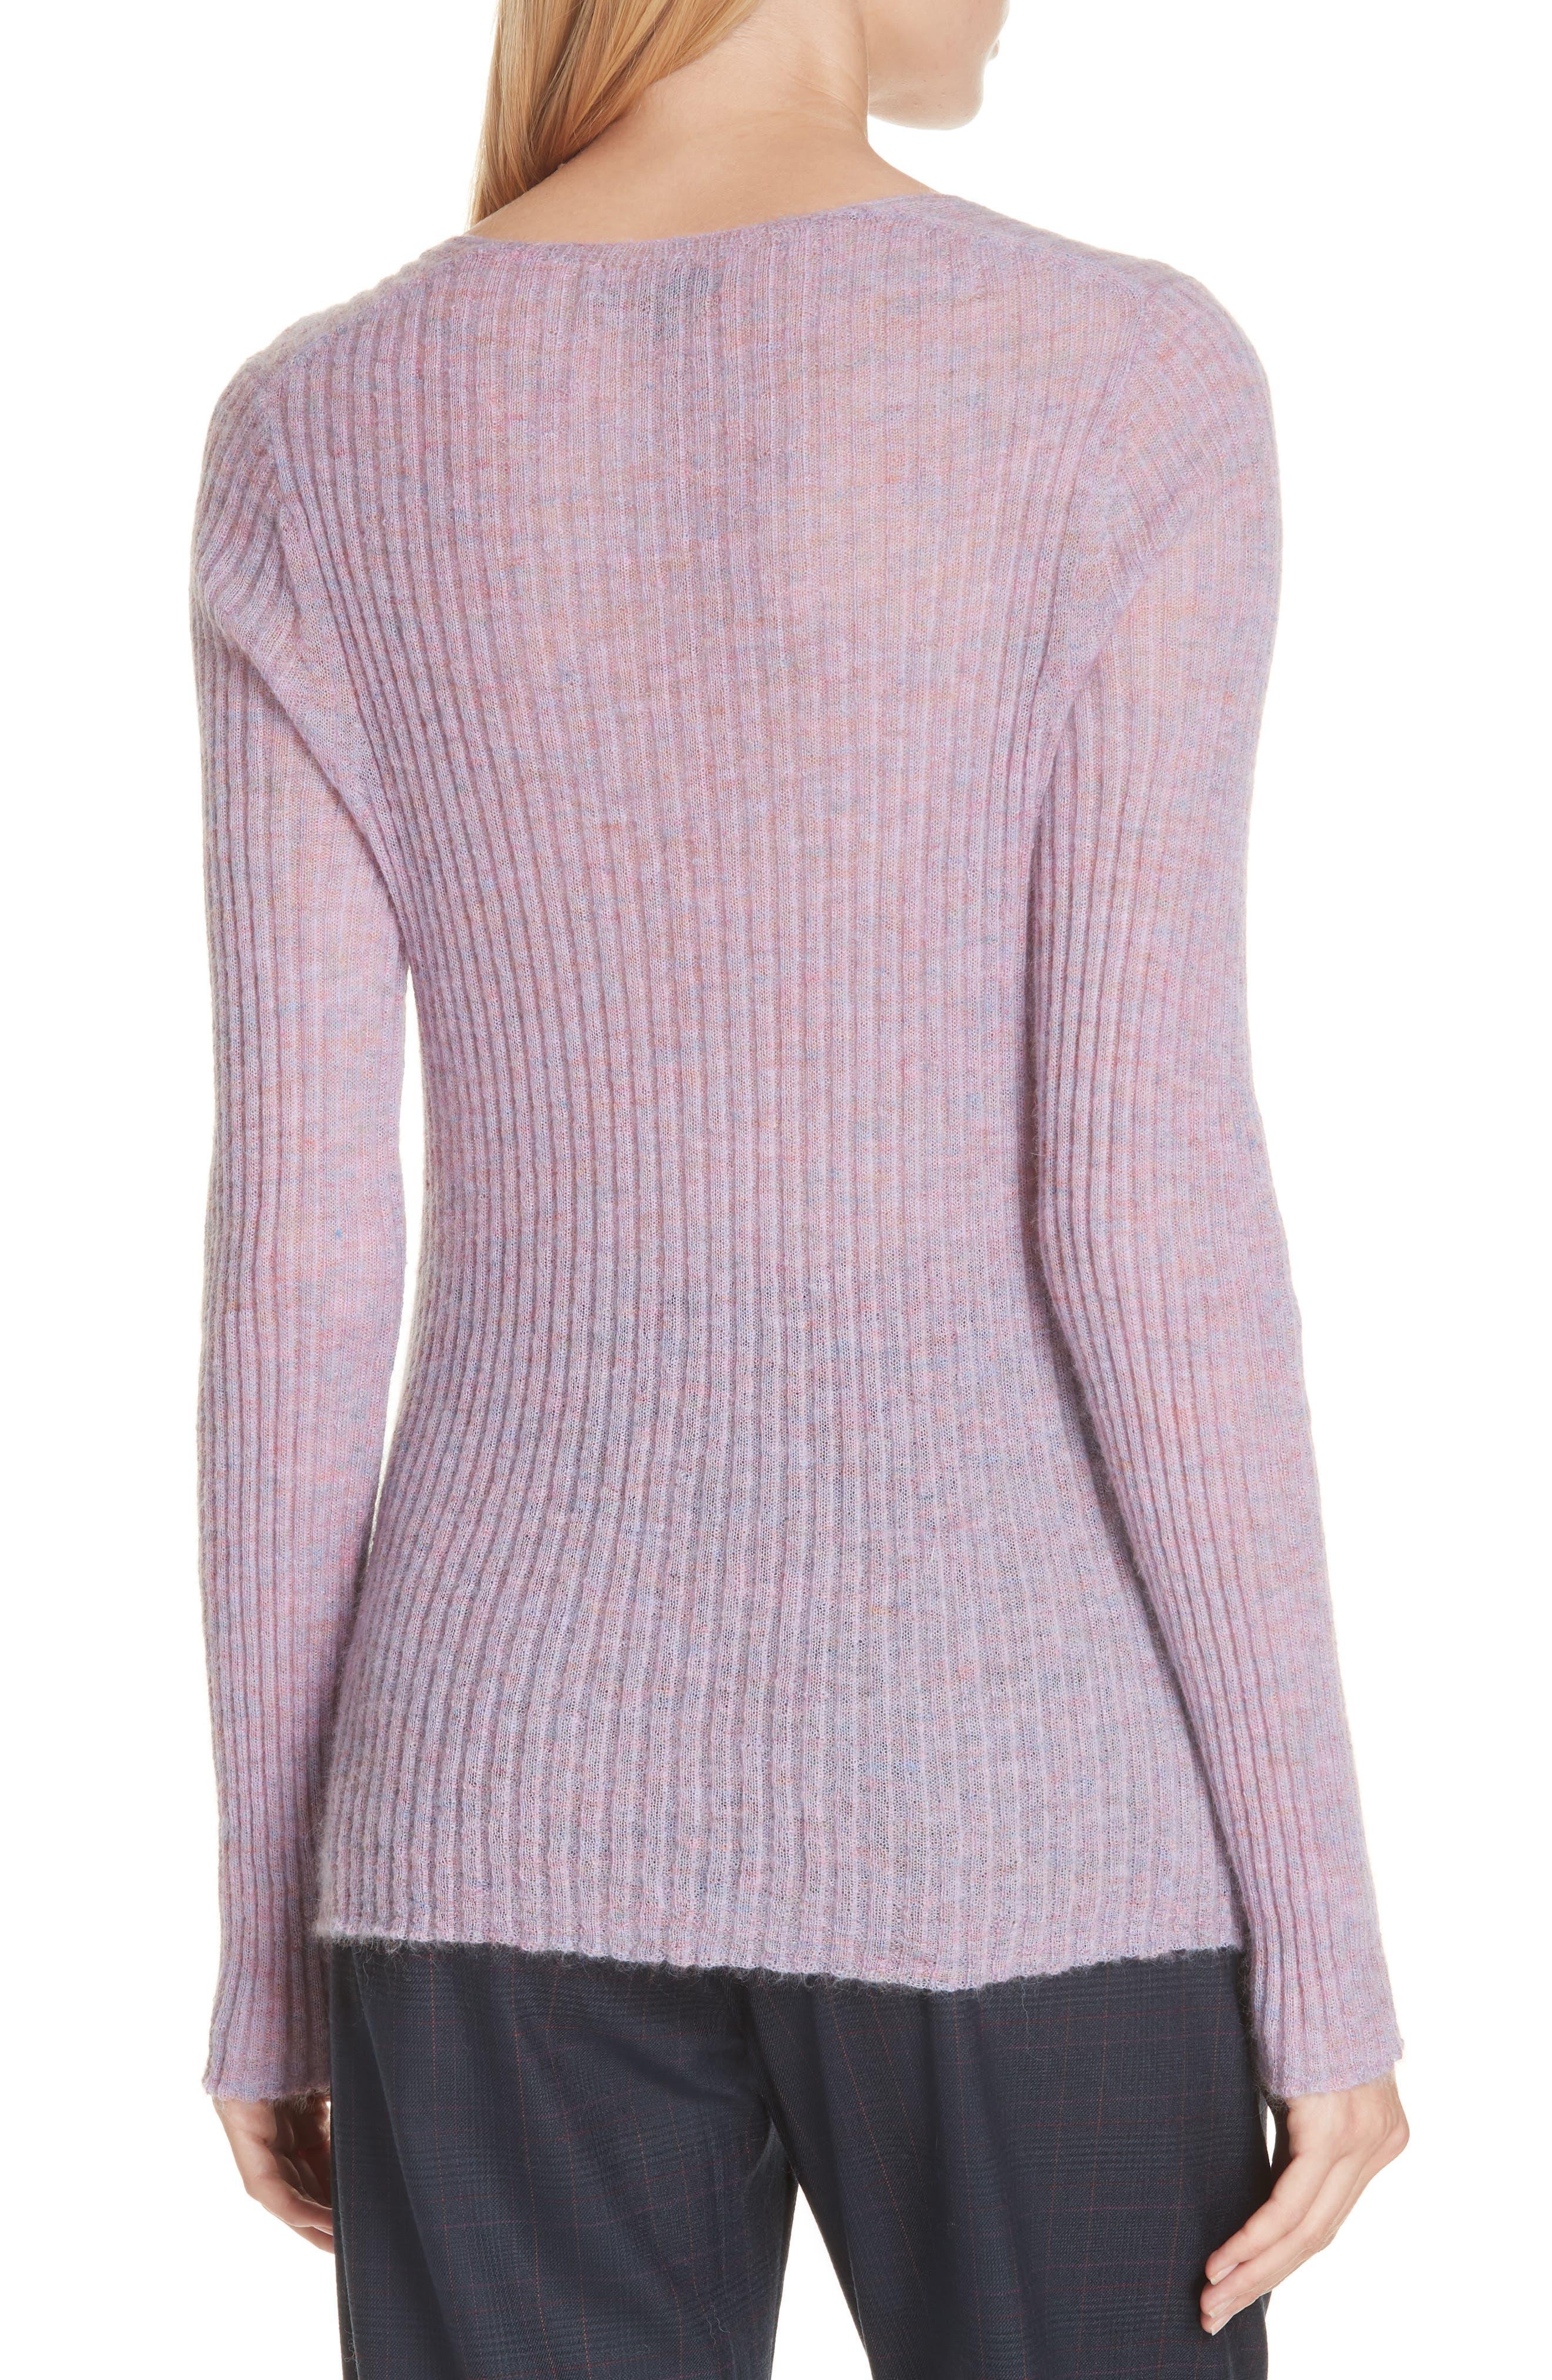 RAG & BONE, Donna Mohair Blend Sweater, Alternate thumbnail 2, color, LILAC